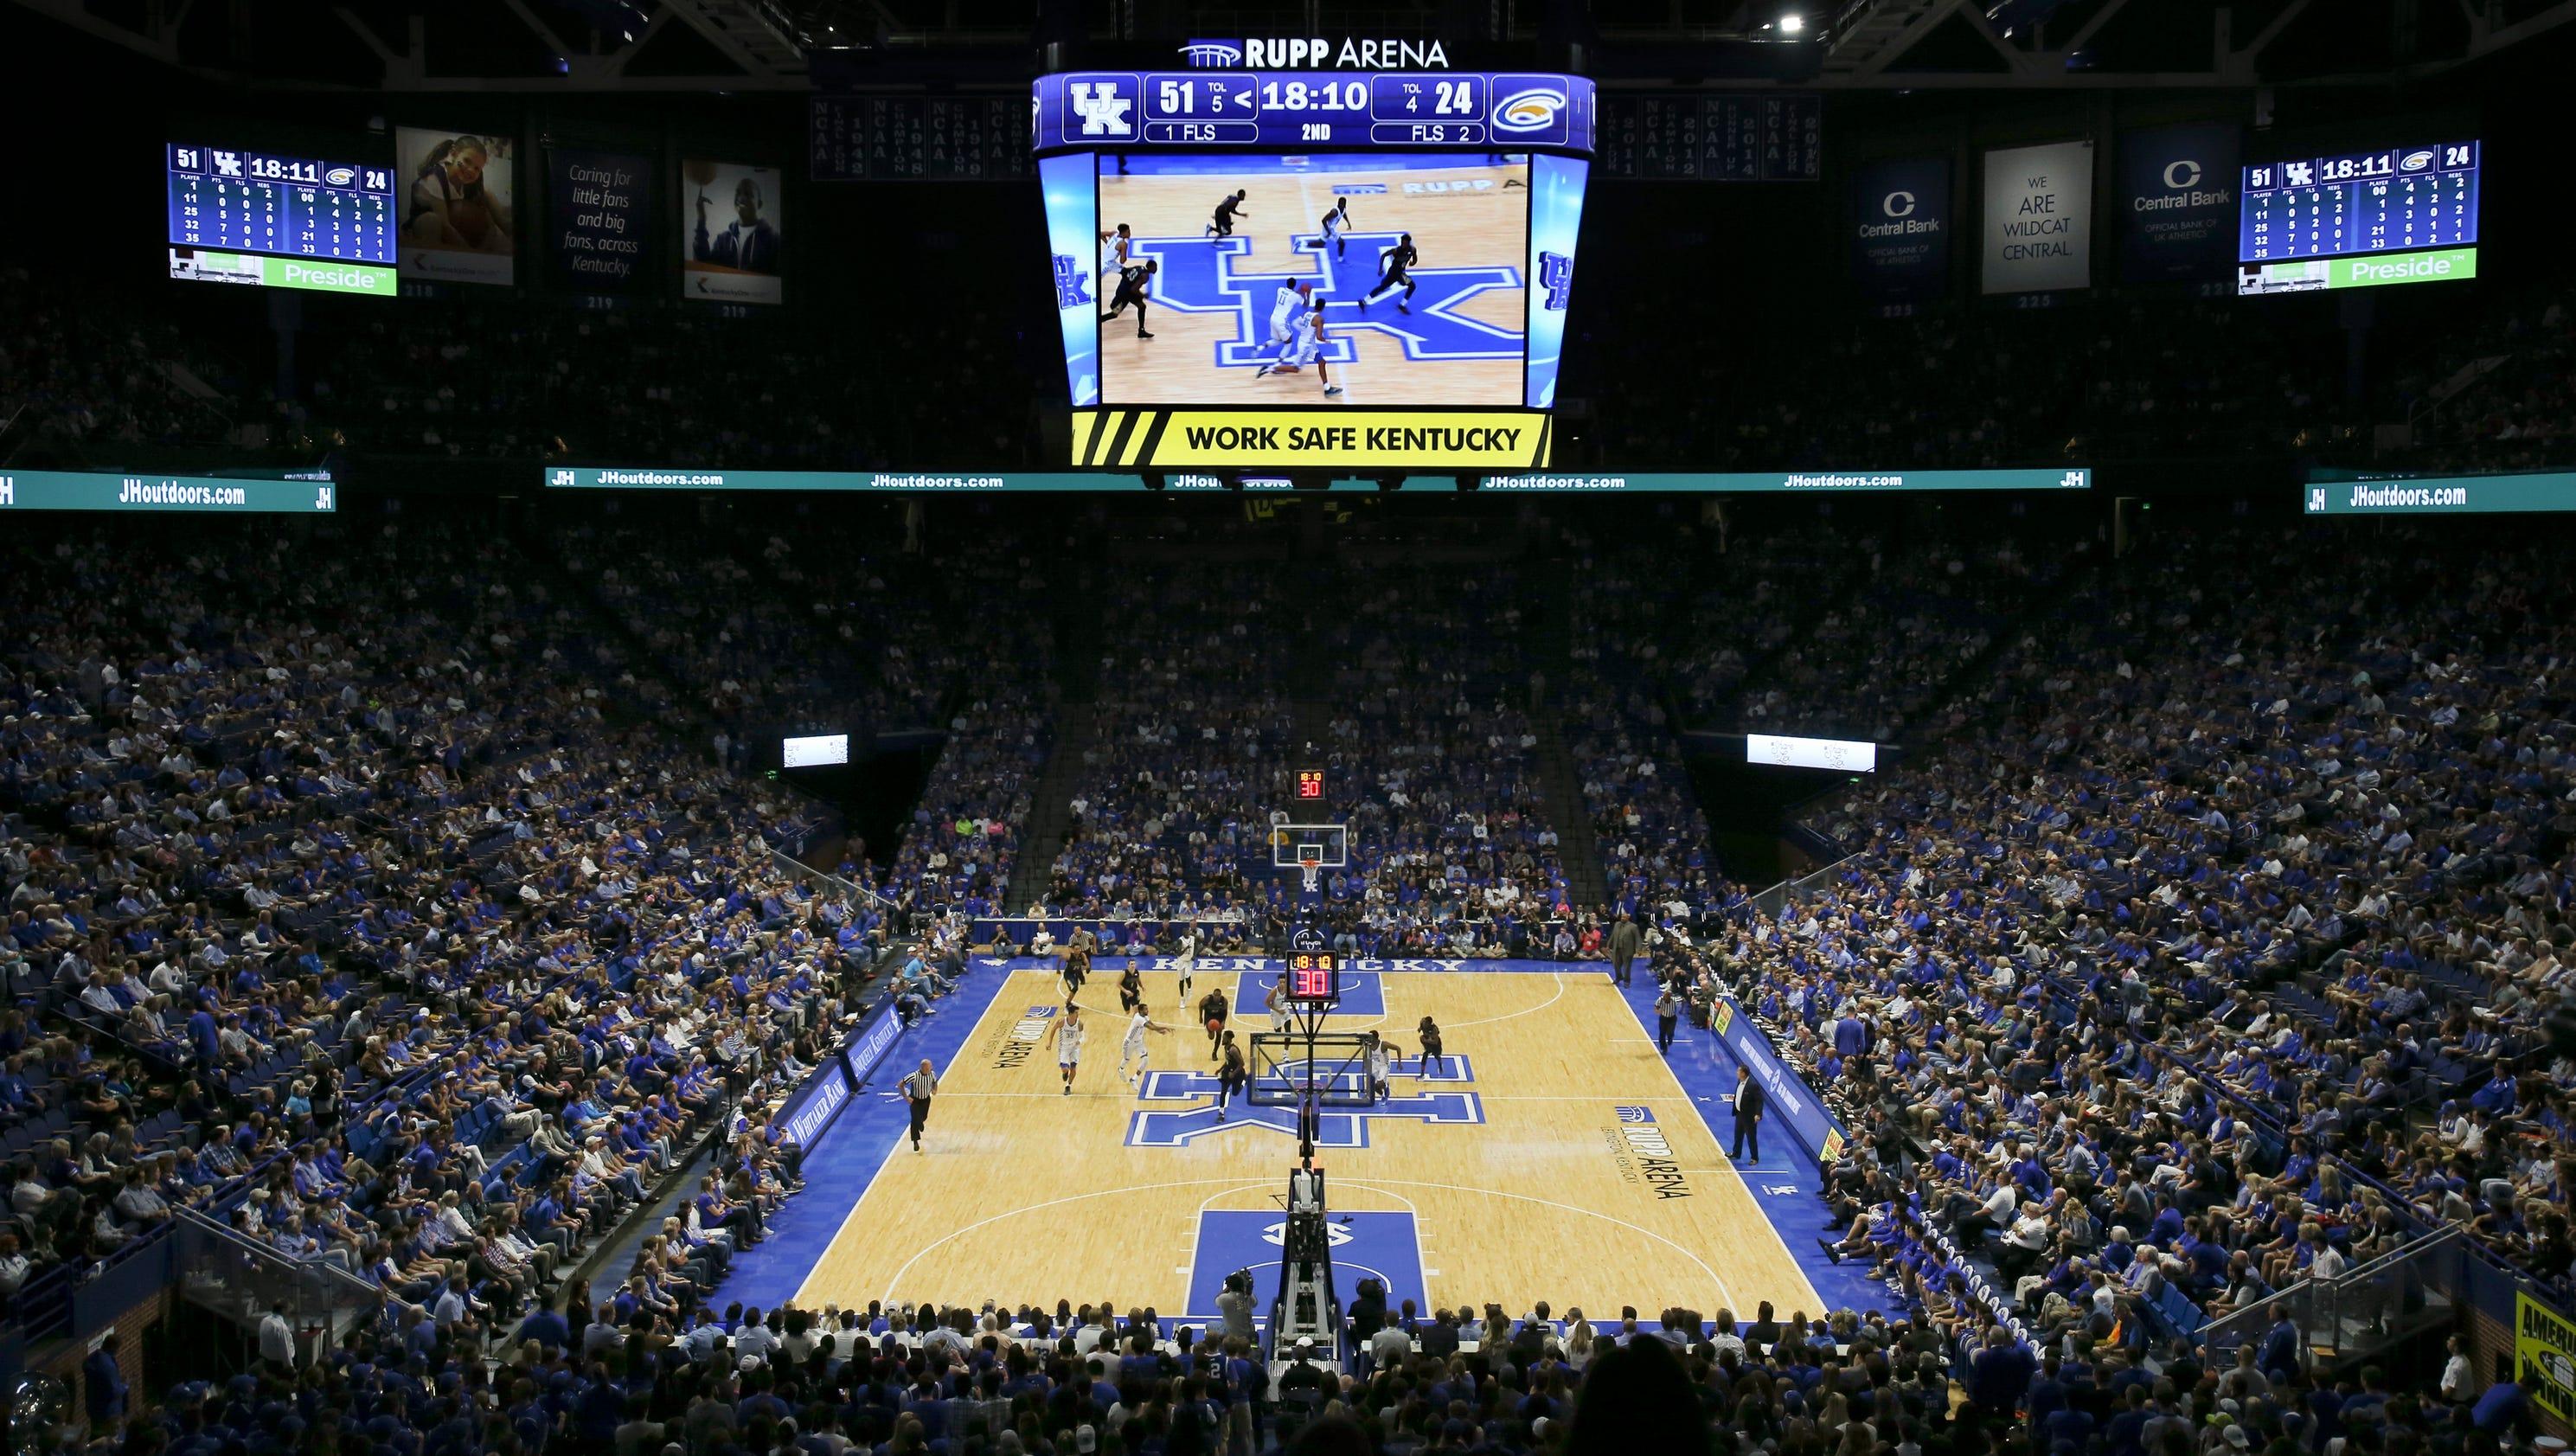 Kentucky Wildcats Basketball 2017 18 Team Photo: Kentucky To Host Virginia Tech In 2017-18